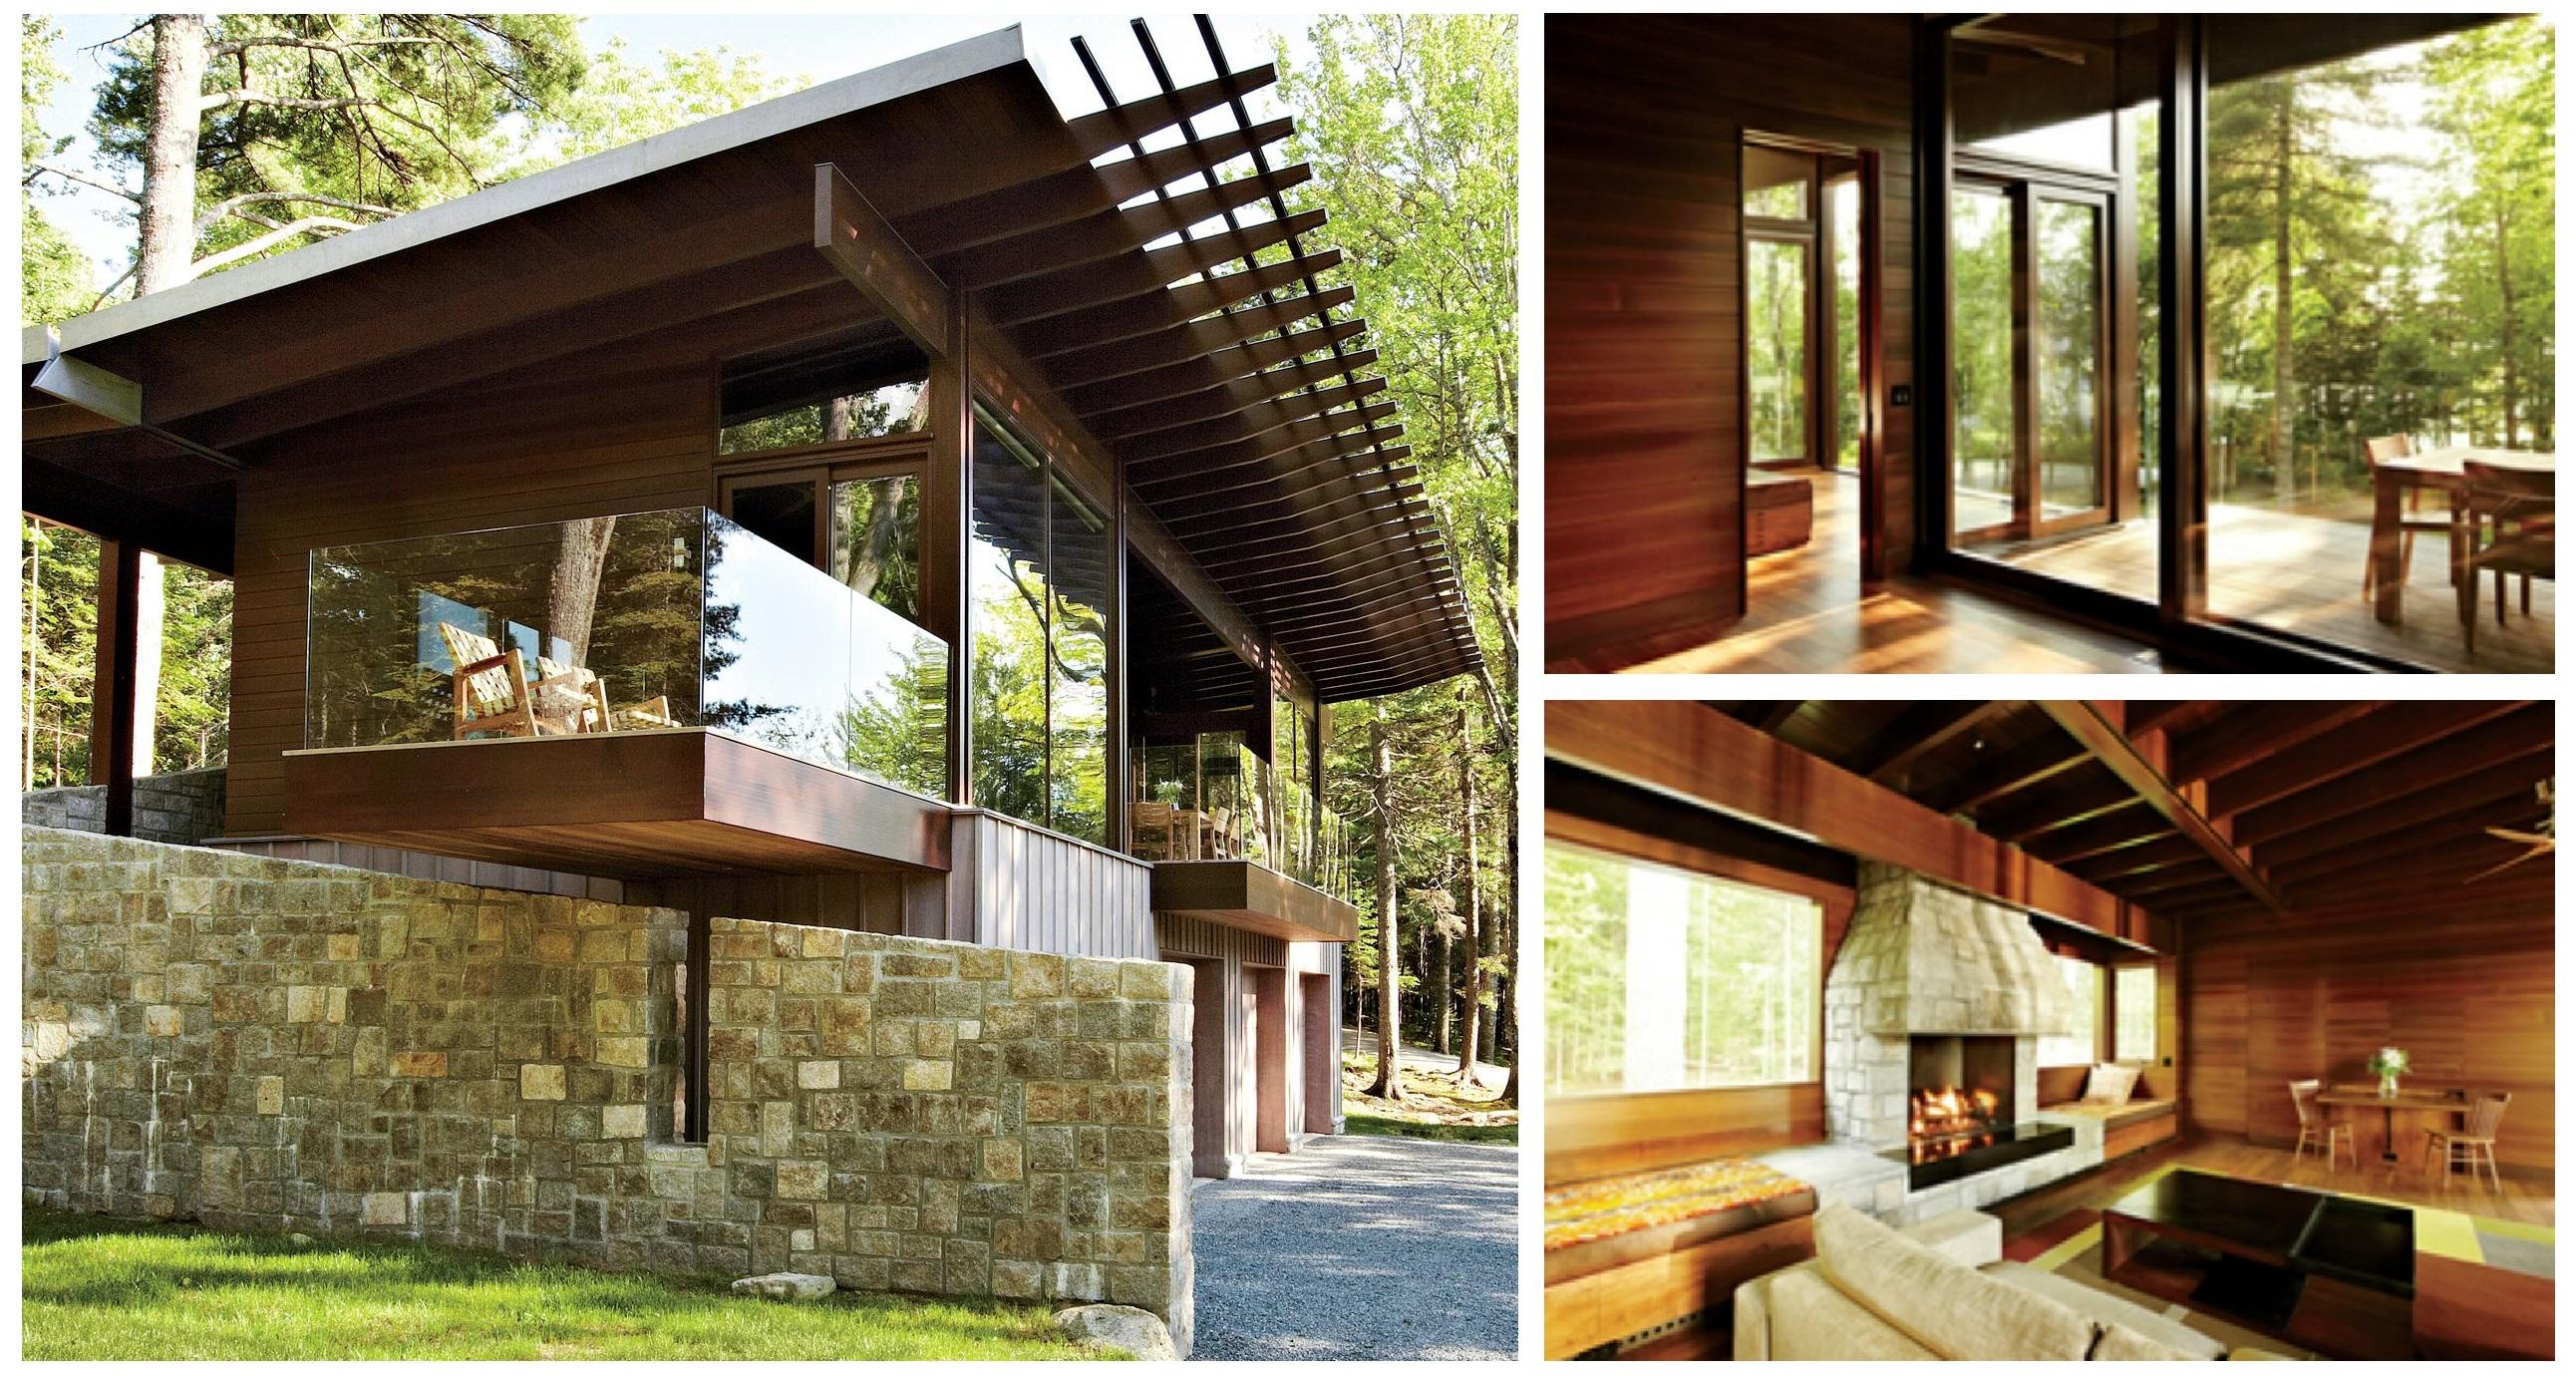 Frank Lloyd Wright Inspired Houses frank lloyd wright-inspired cabin house